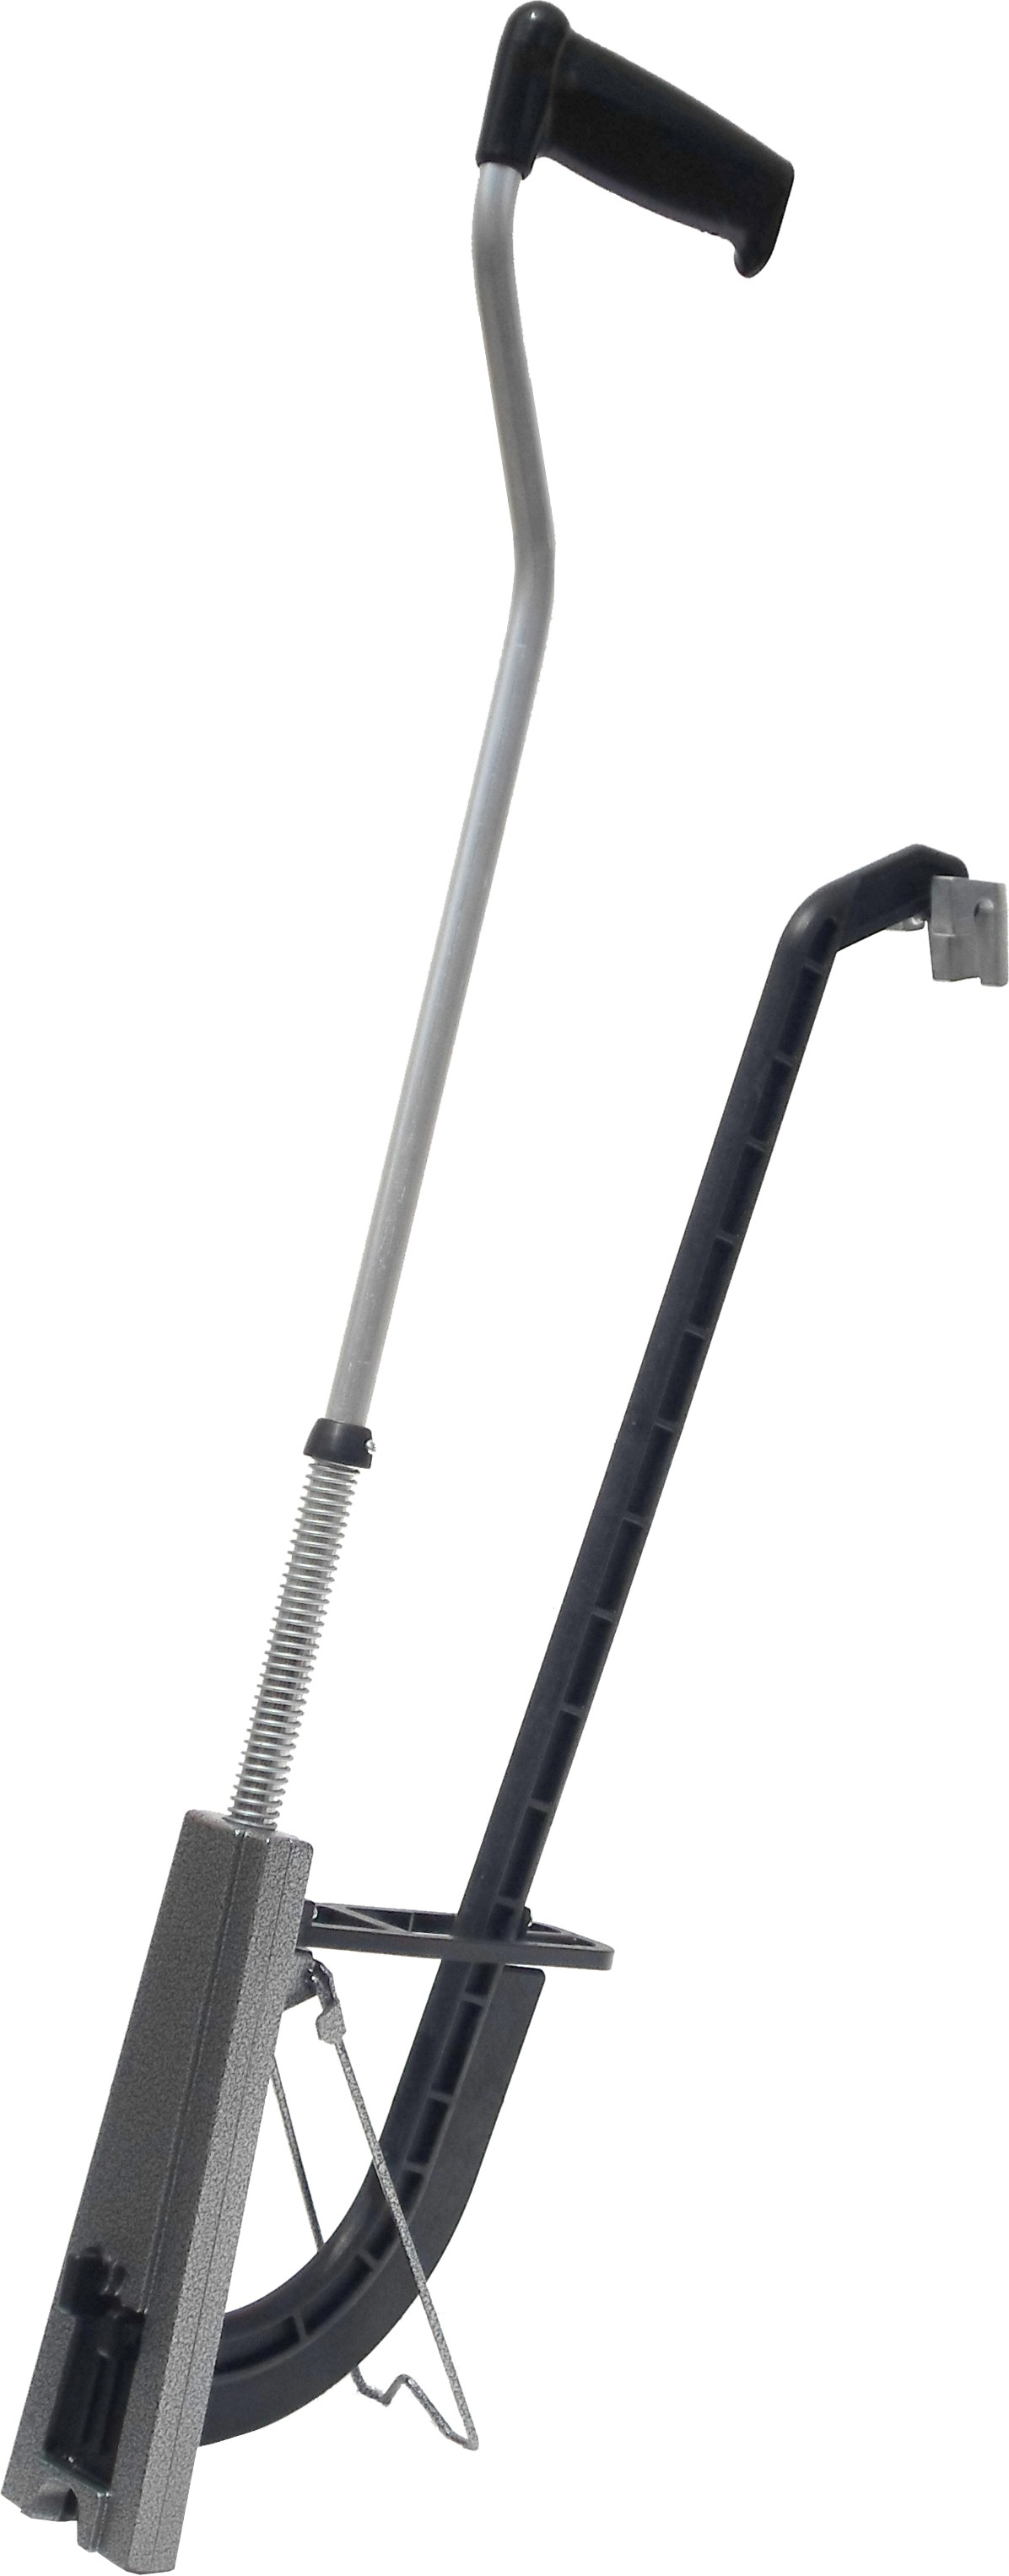 CAPRICORN S.A. Tacker pro plastové spony CapriFloor 9-1240-000-00-35-03